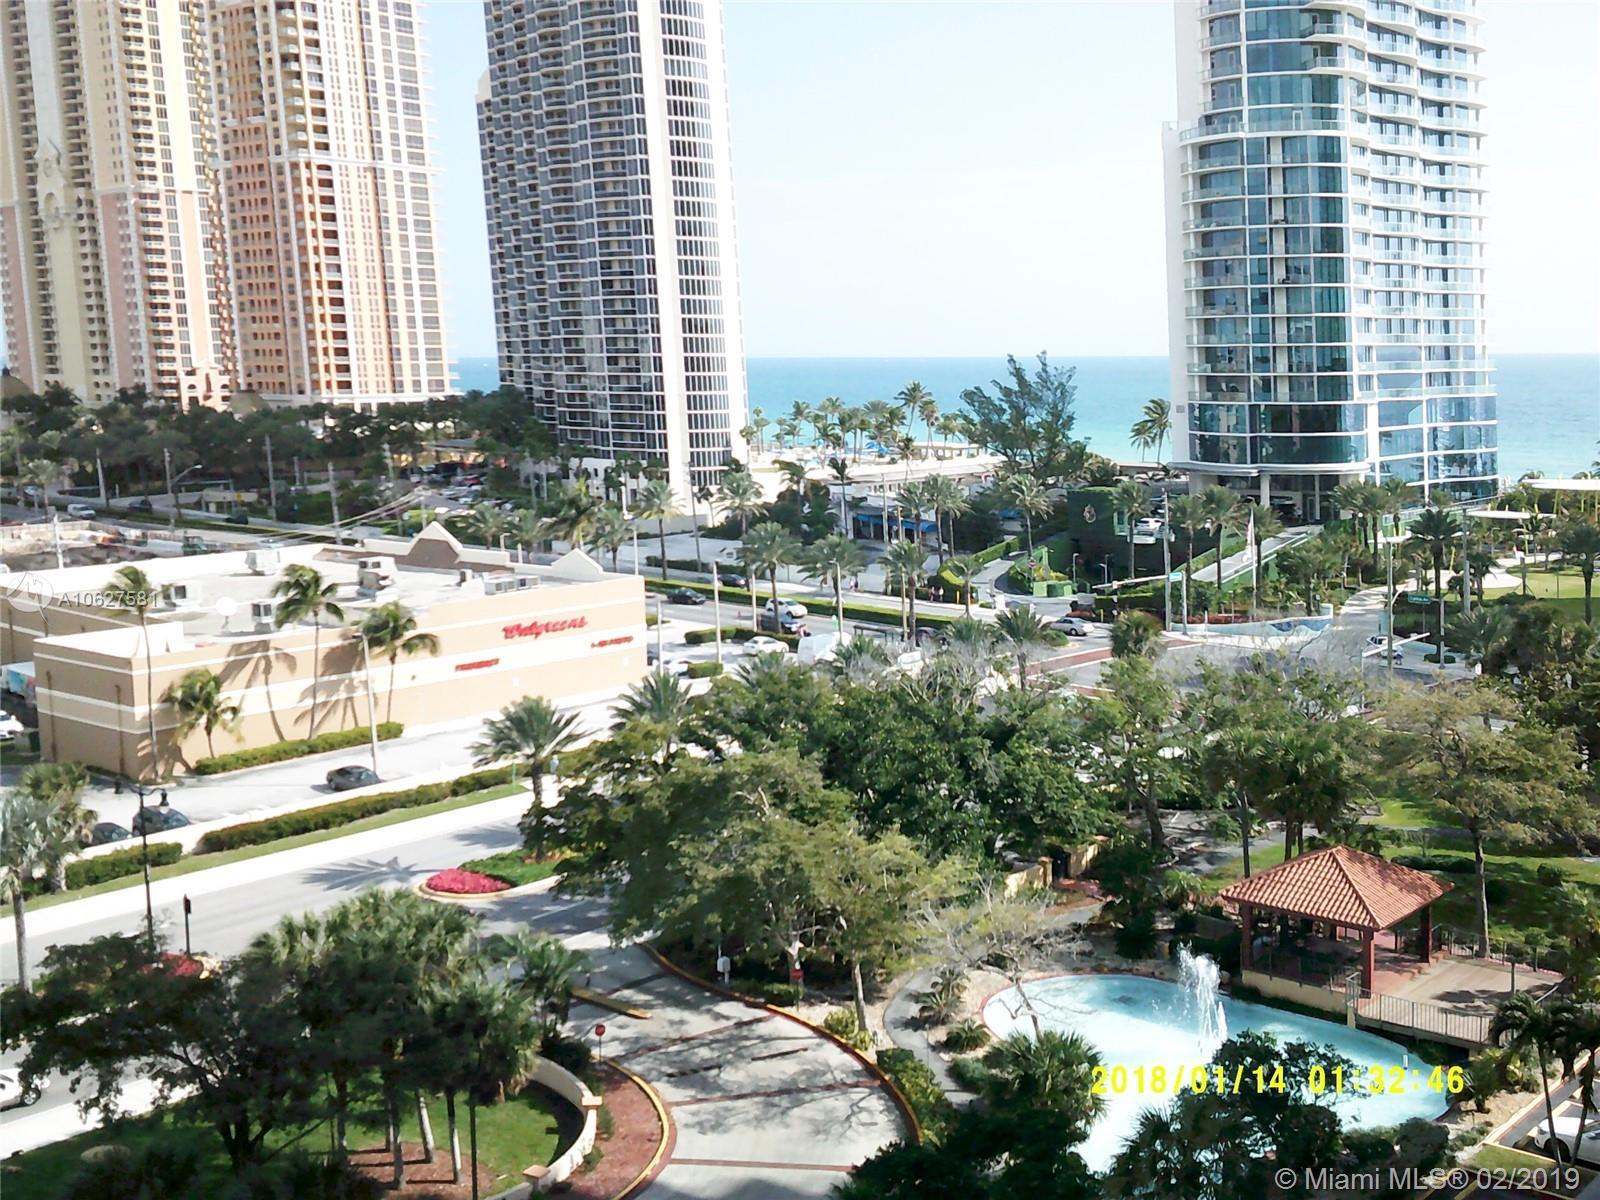 210 174 St. 1014, Sunny Isles Beach, FL 33160